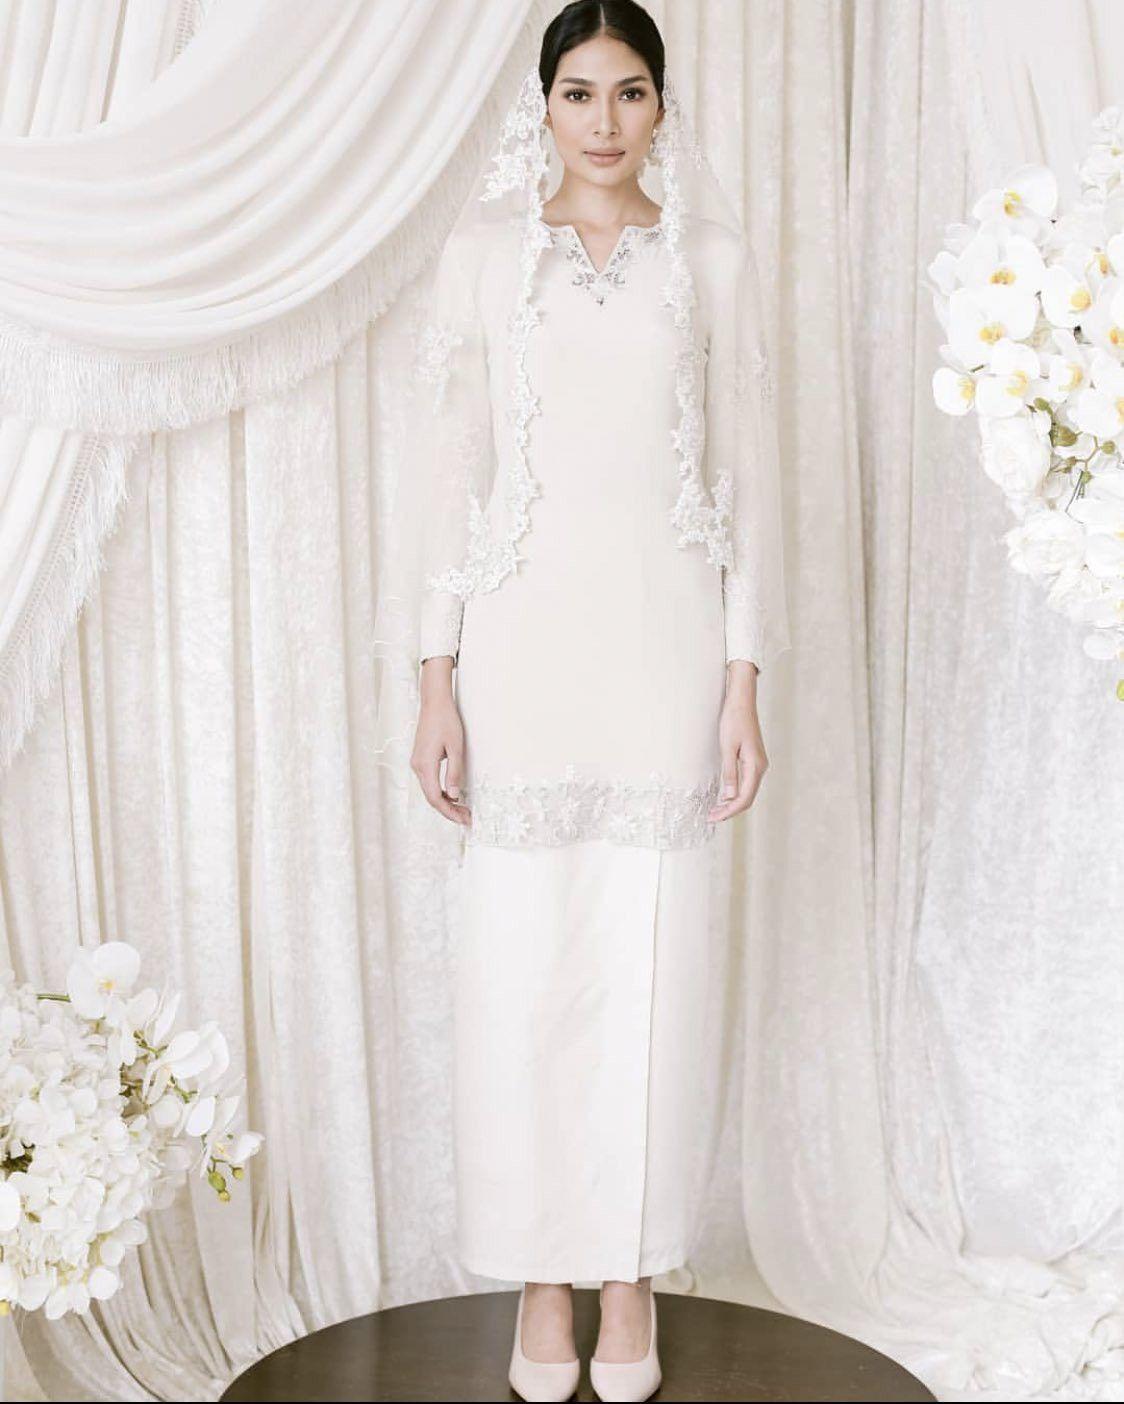 Baju nikah putih  Minimal wedding dress, Hijab wedding dresses